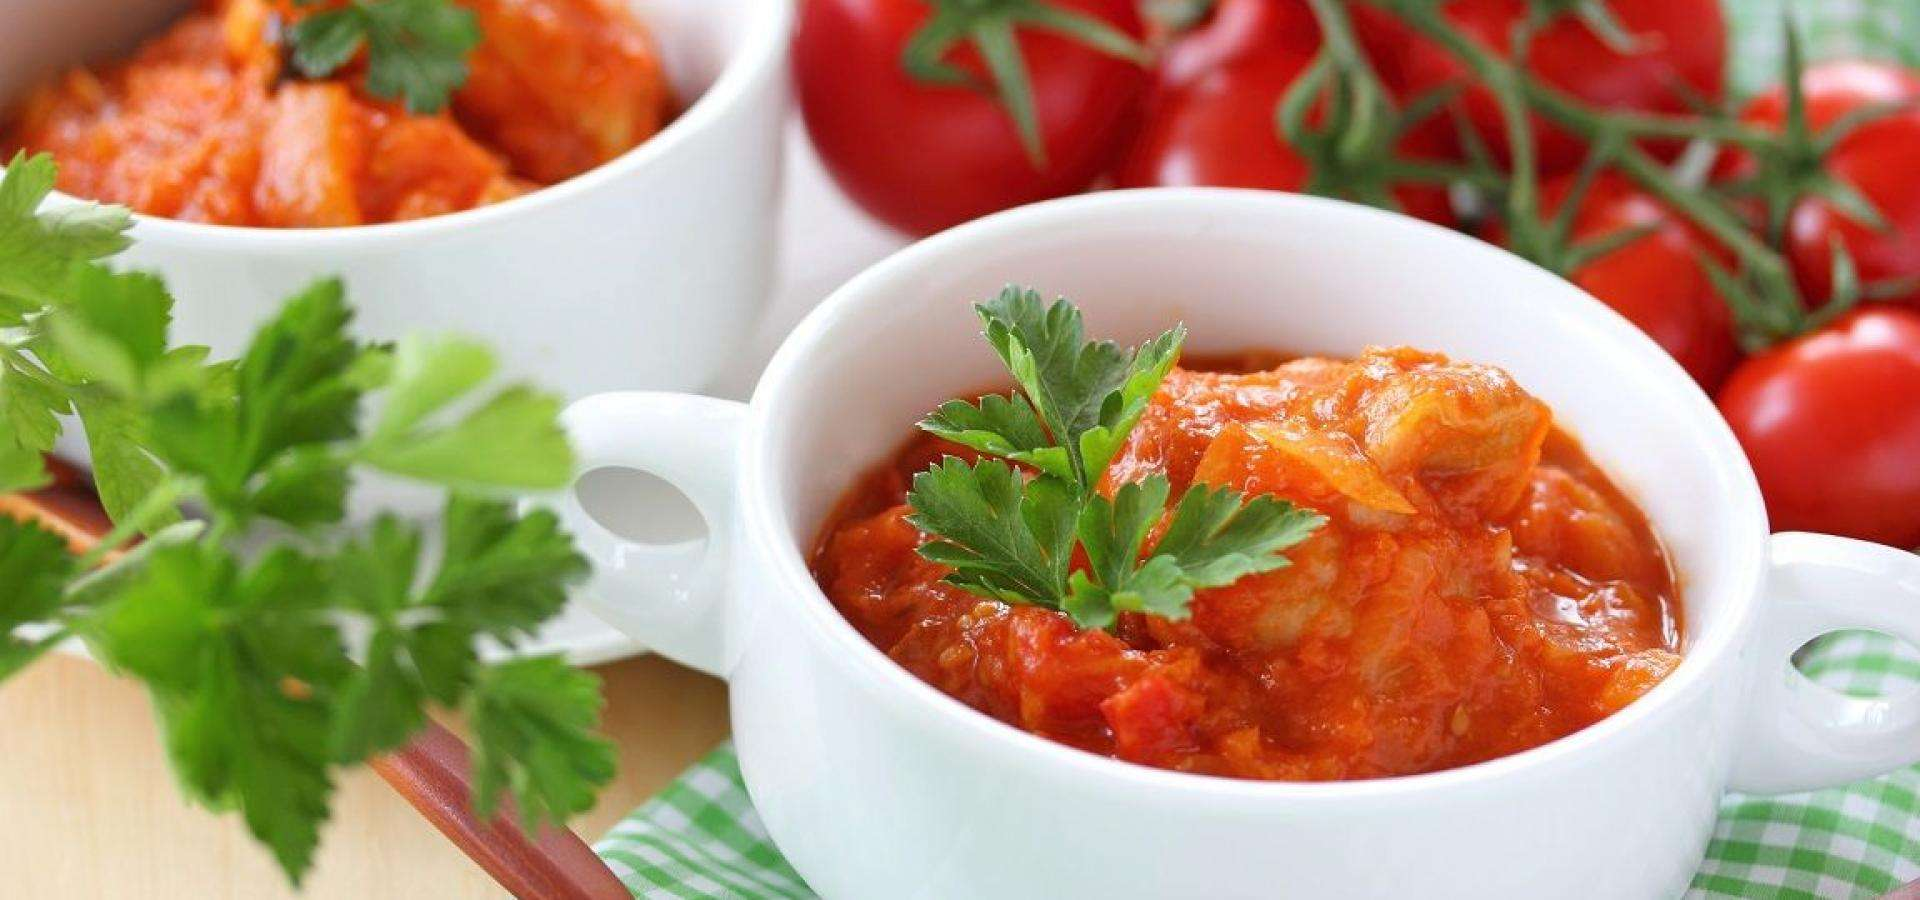 Receta de Ragú de tomate de Ed Brown